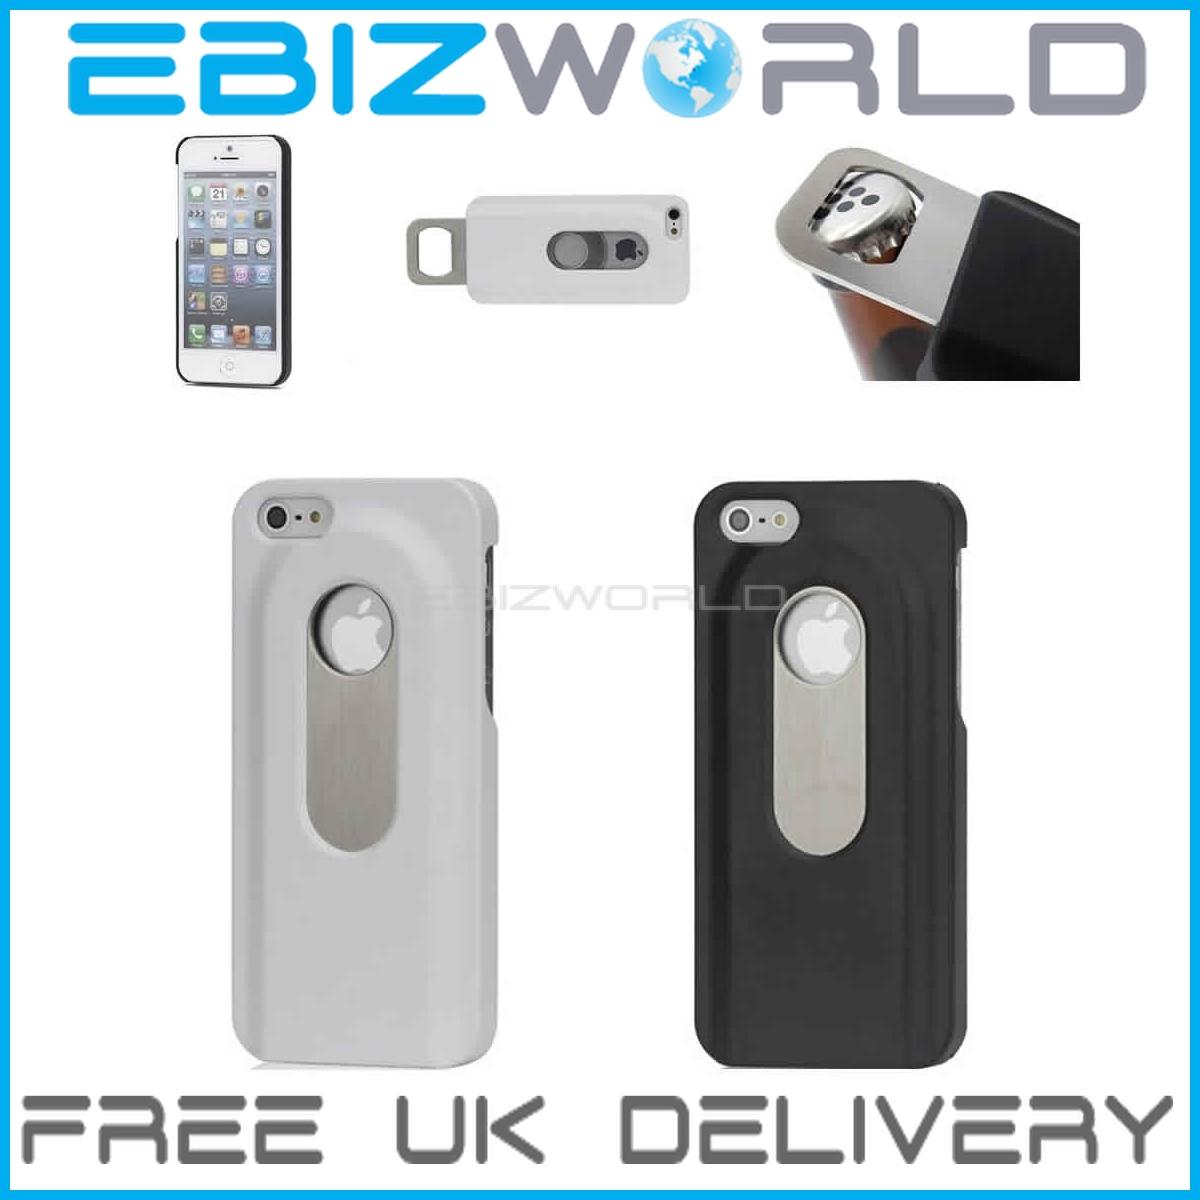 stainless steel bottle opener hard case for iphone 5 5g cover shell slide apple ebay. Black Bedroom Furniture Sets. Home Design Ideas